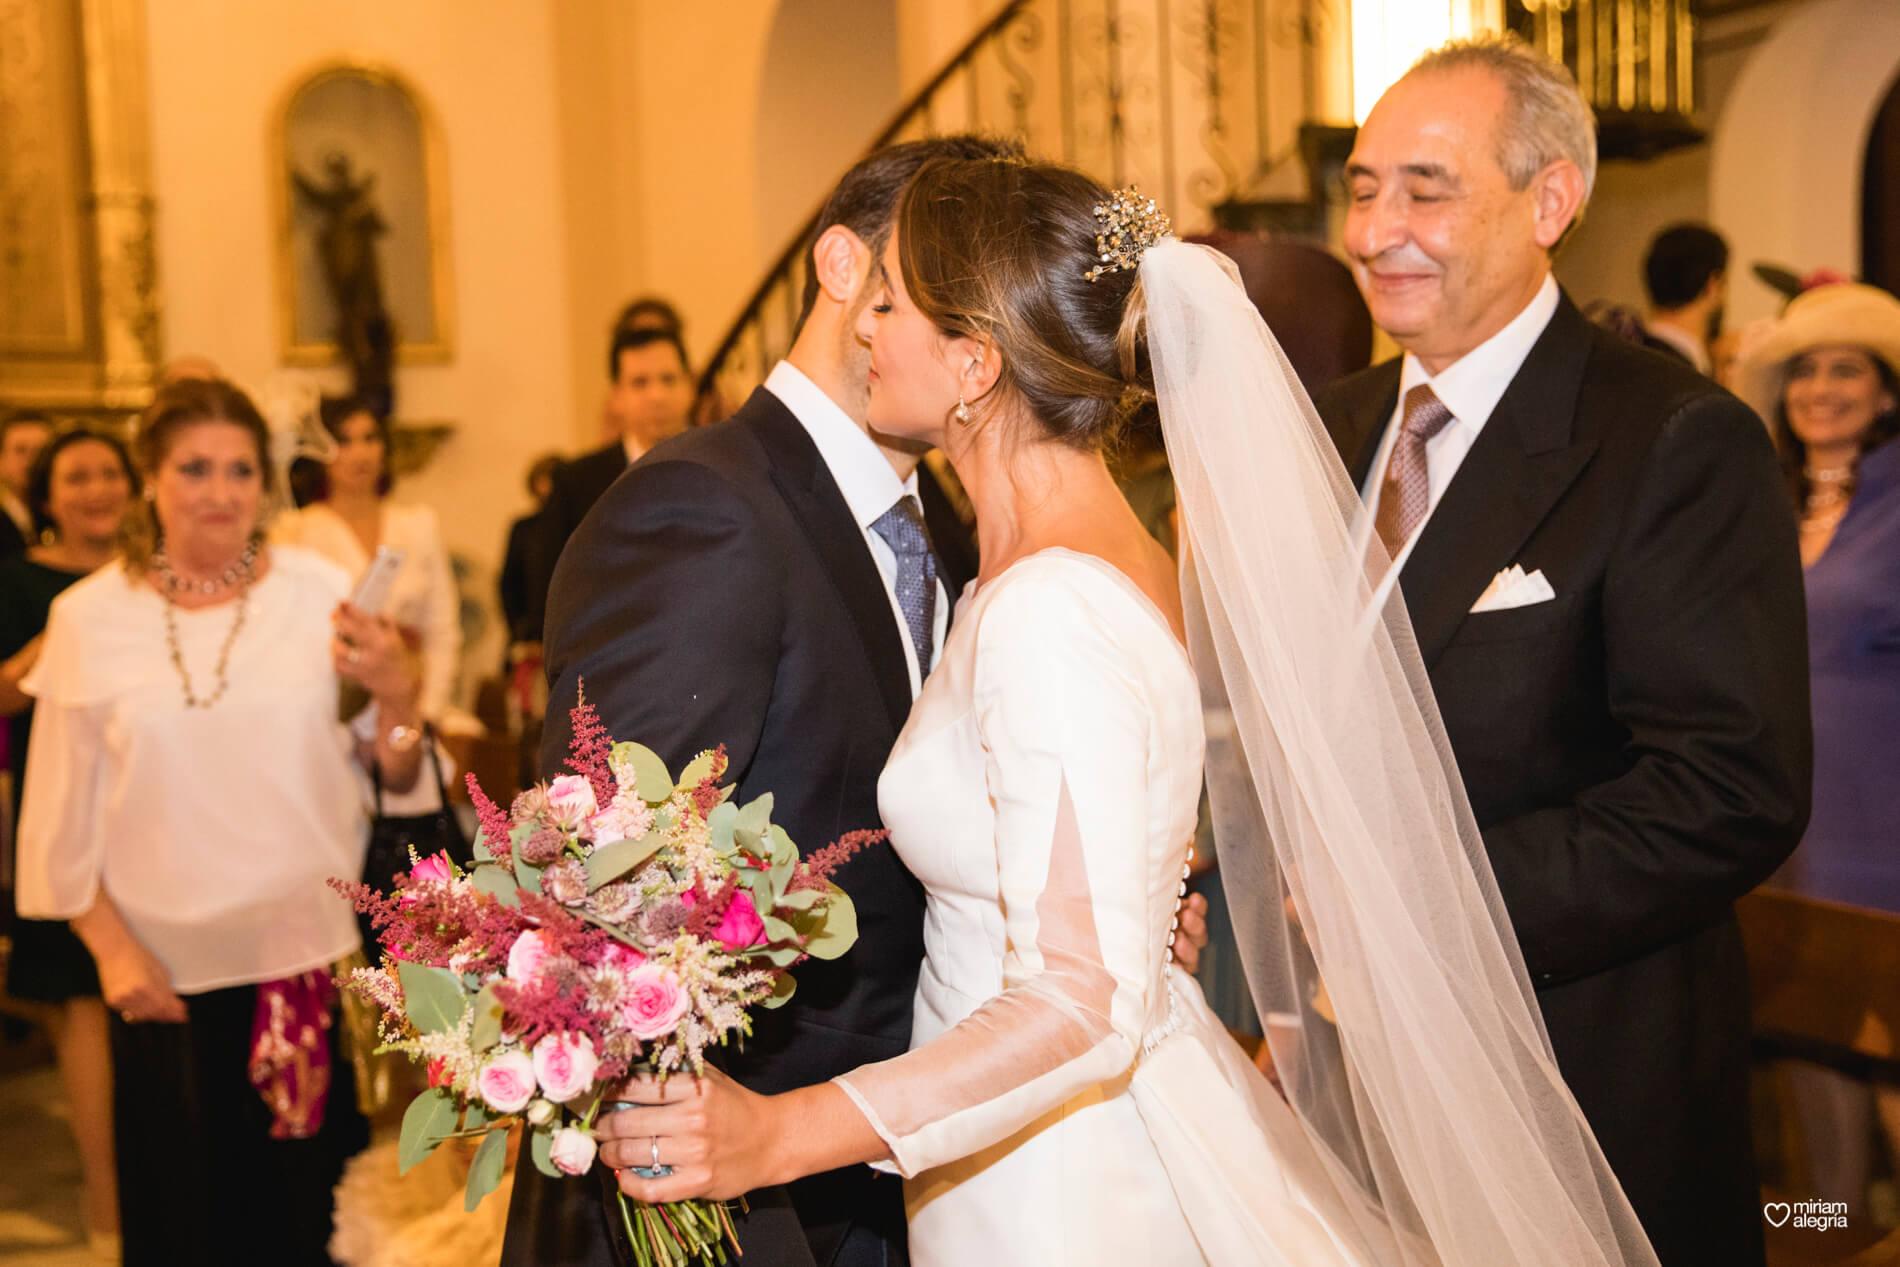 vestido-de-novia-paula-del-vas-miriam-alegria-fotografos-boda-murcia-47